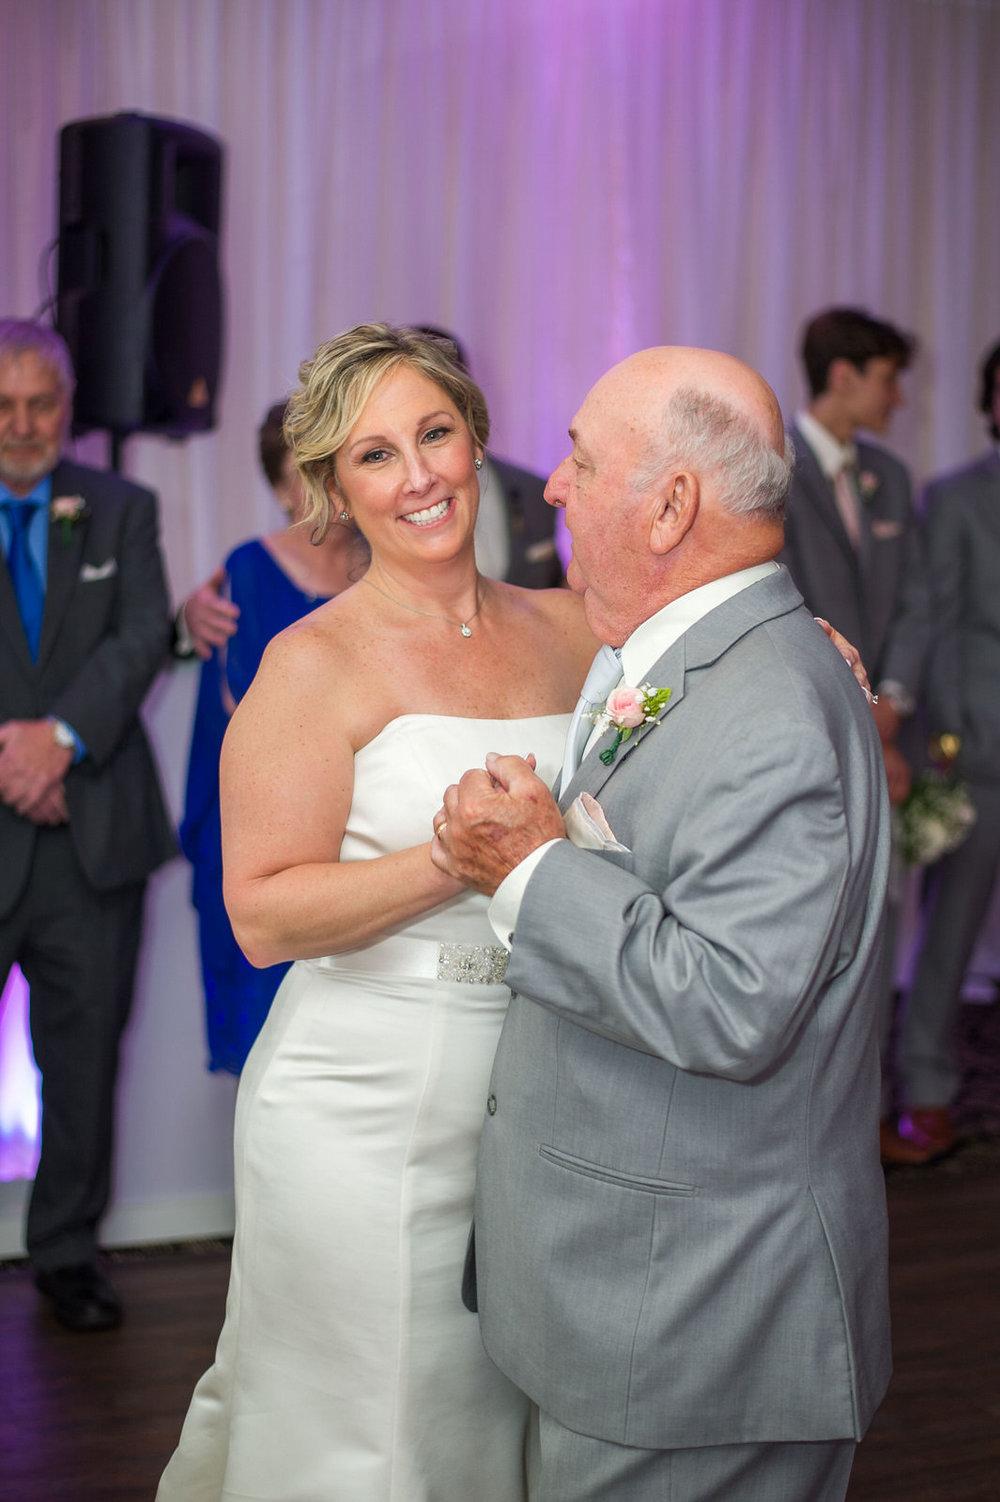 Mike_&_Barbaras_Wedding_3_24_2018-261.jpg